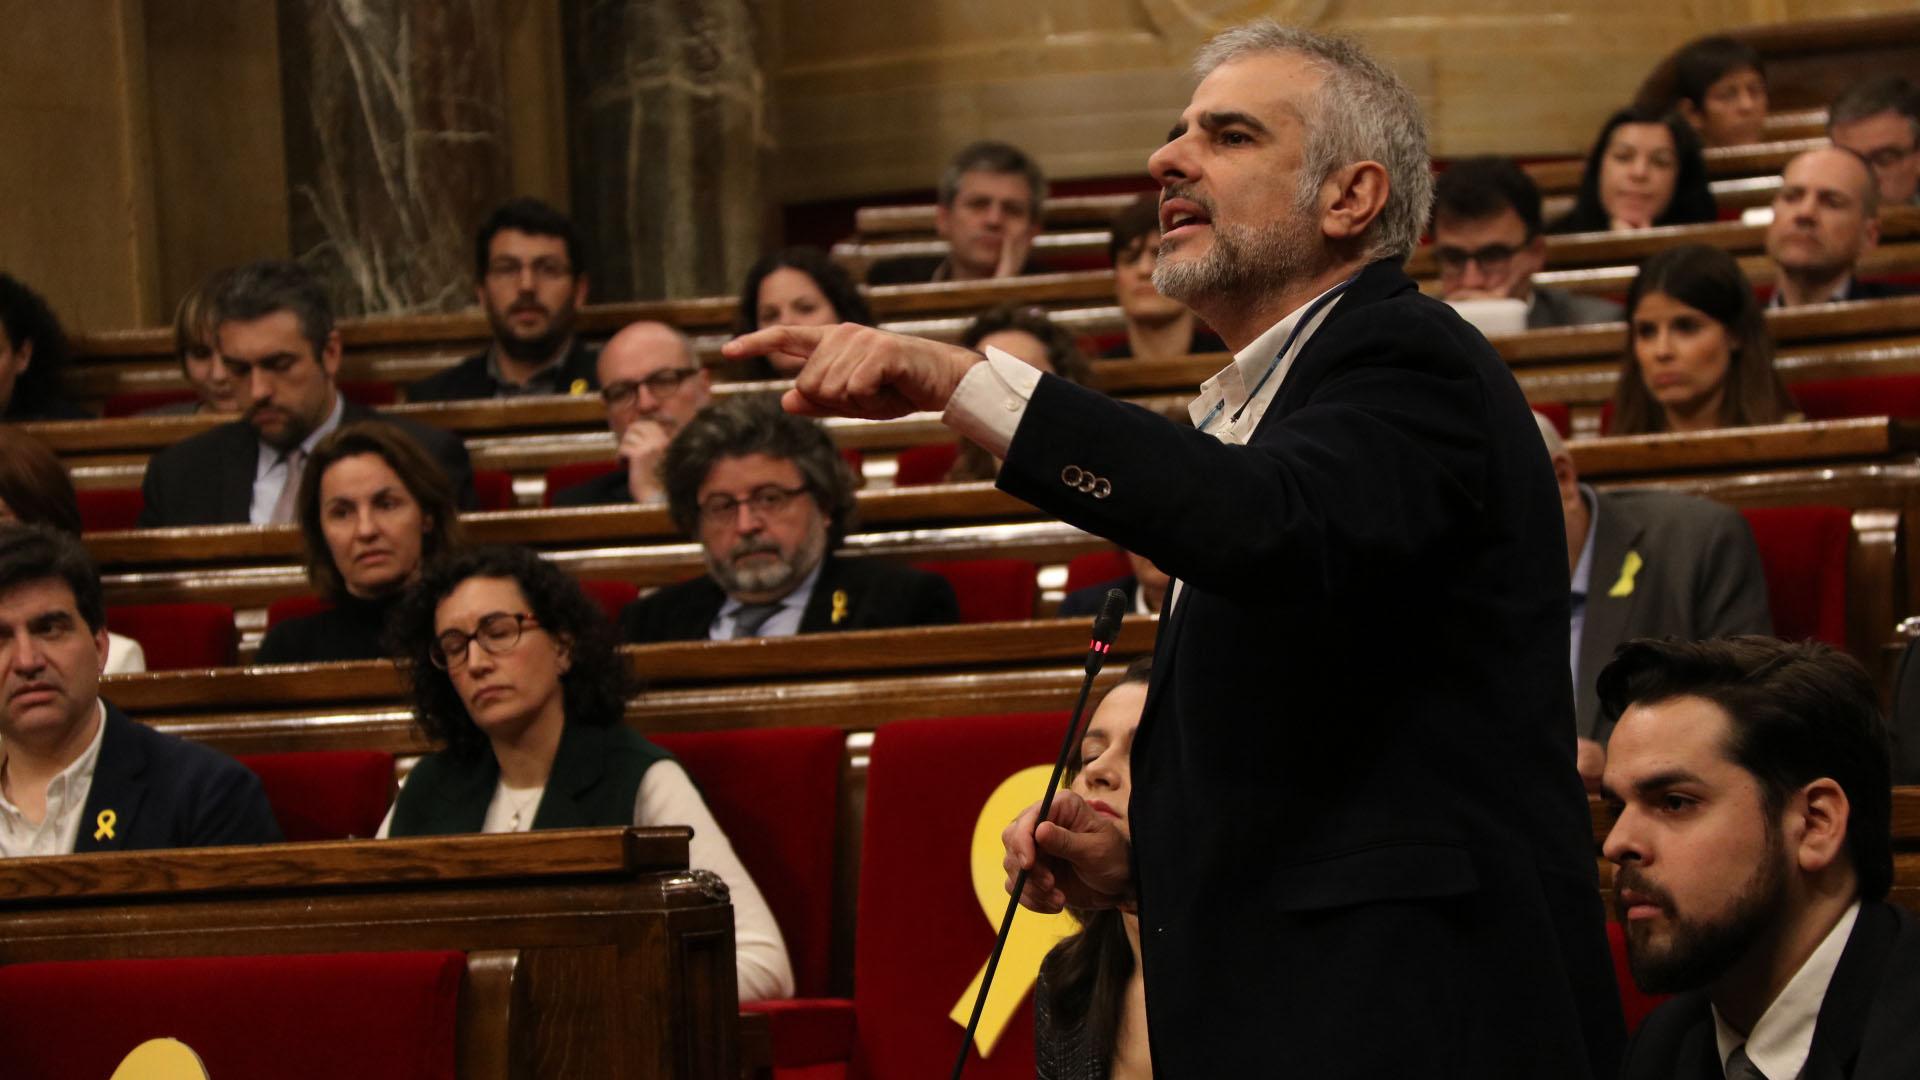 El diputat de Ciutadans, Carlos Carrizosa